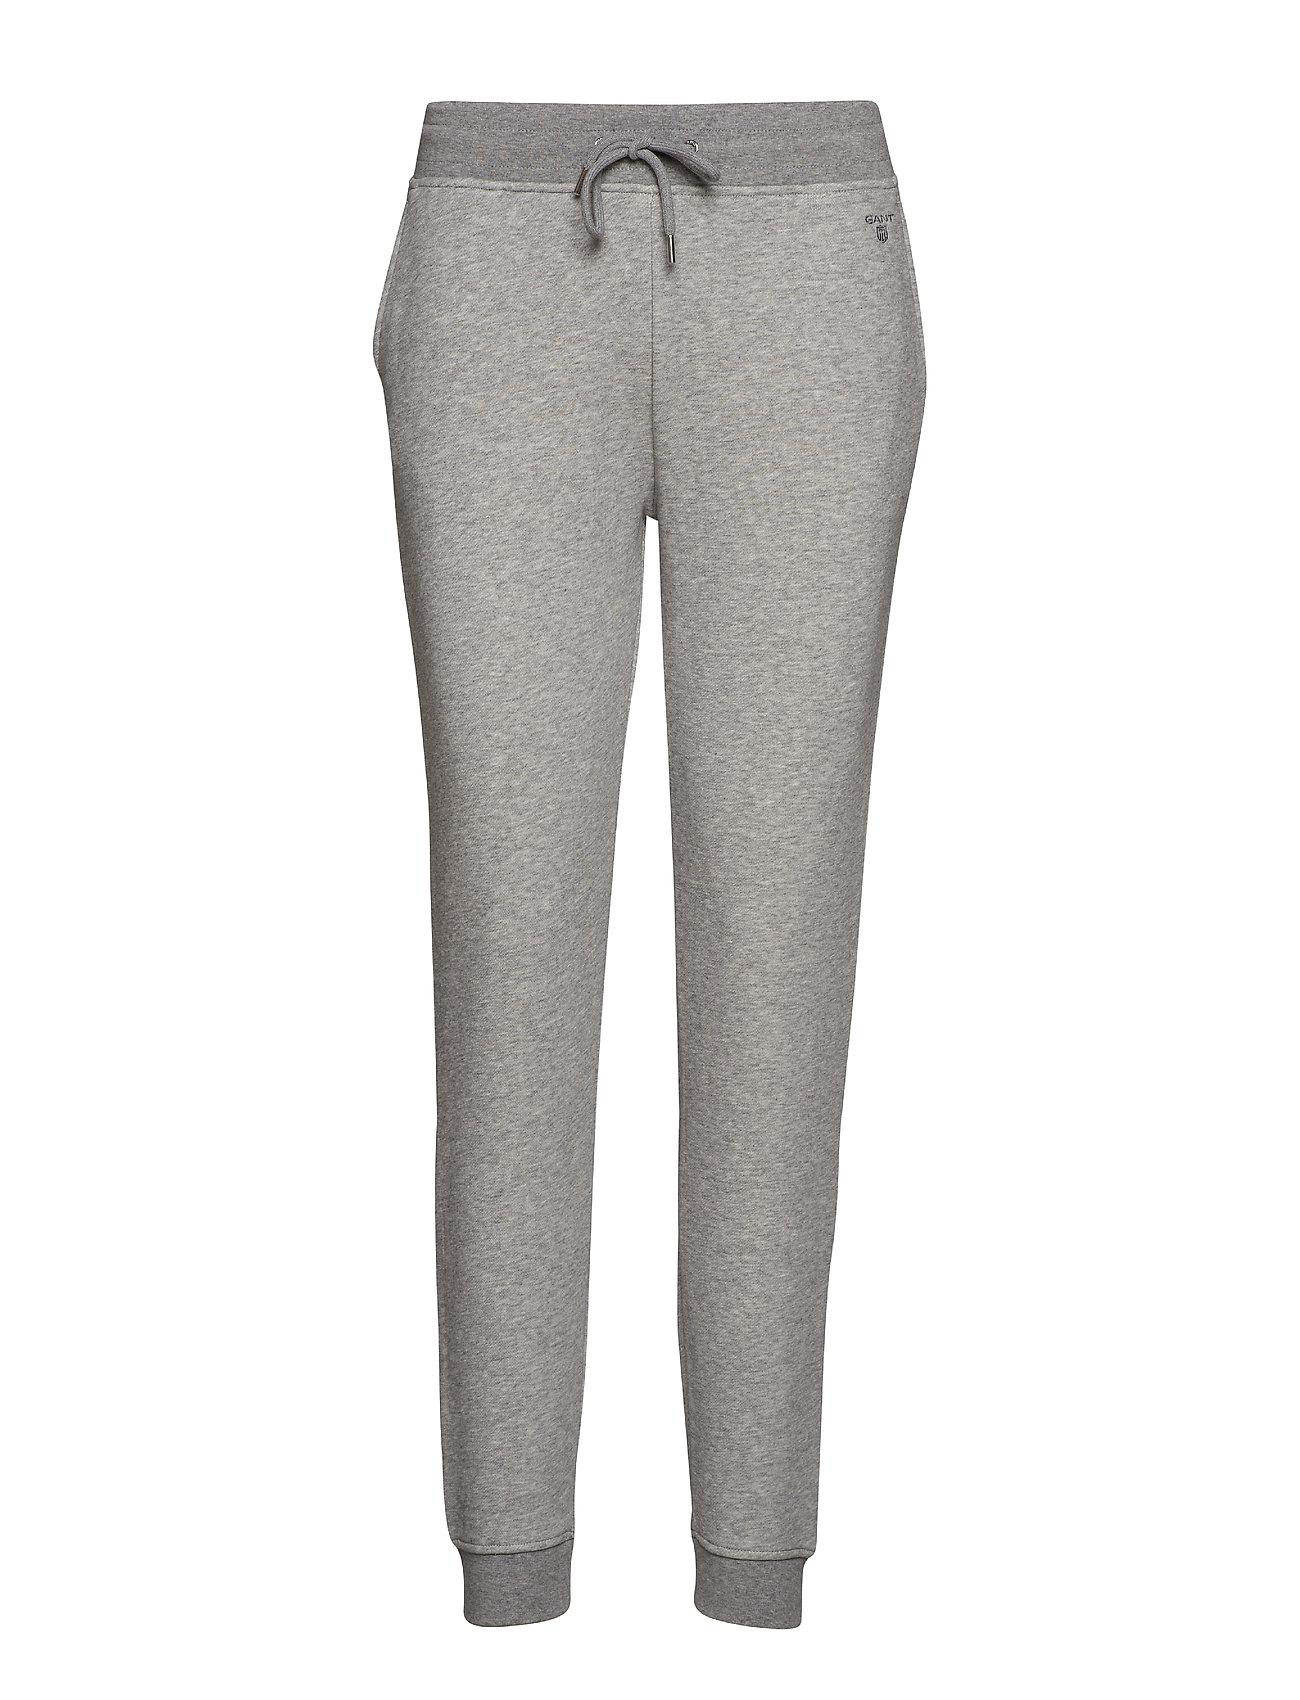 Gant TONAL SHIELD SWEAT PANTS - GREY MELANGE